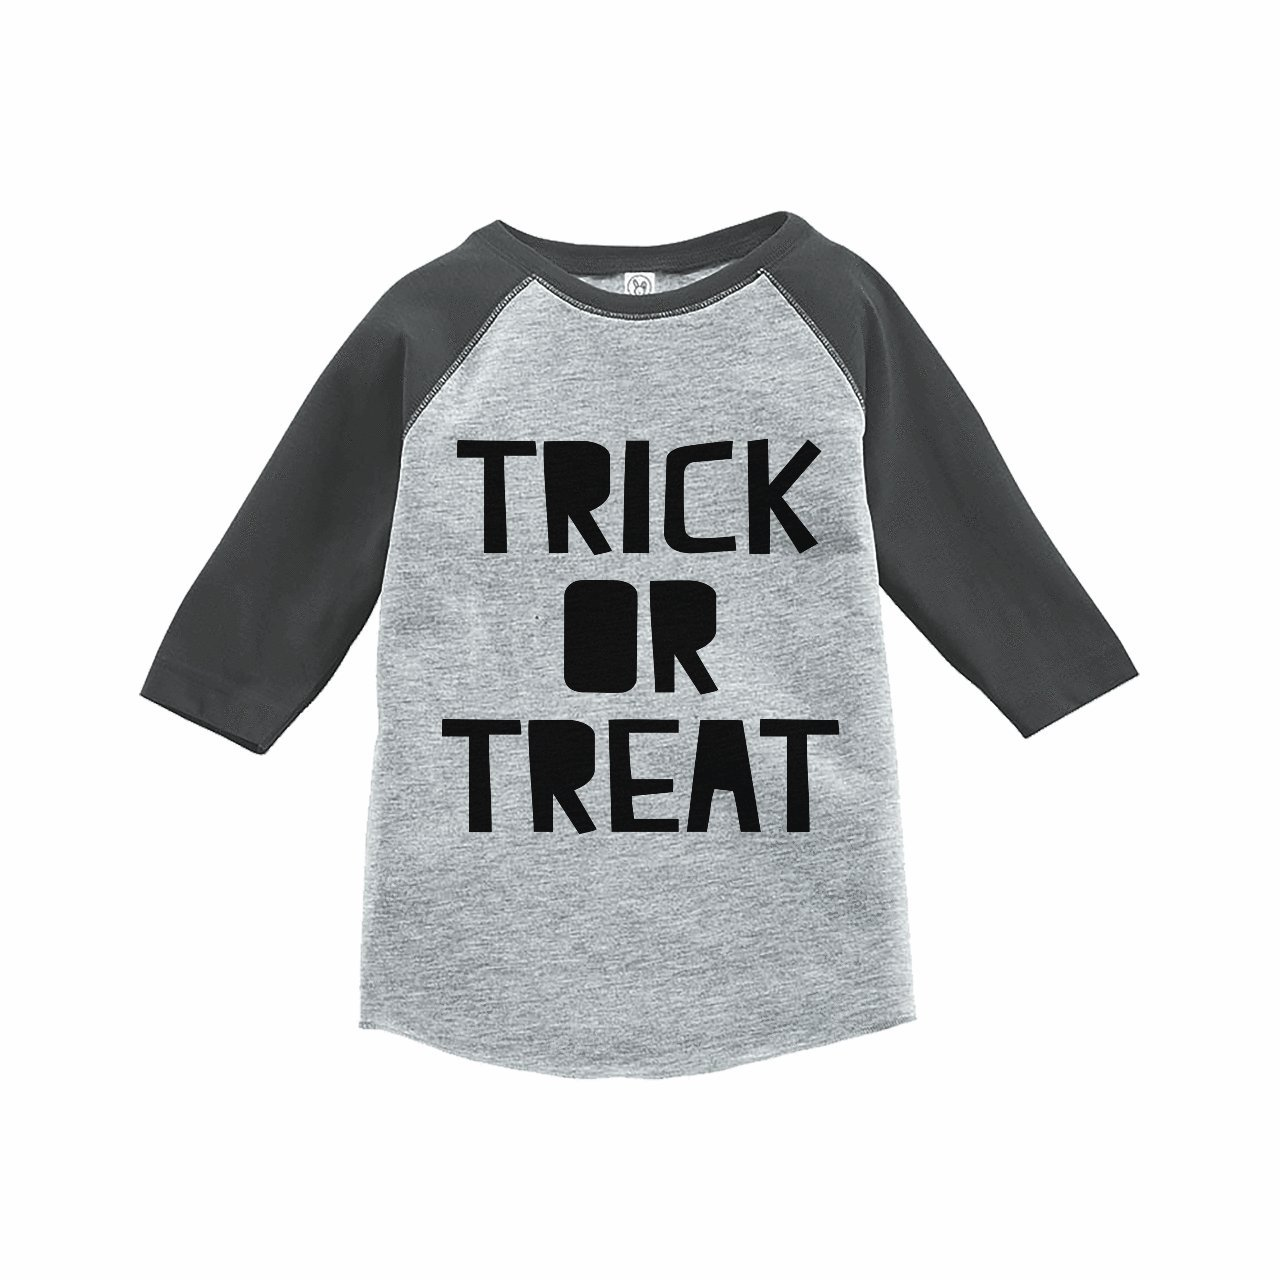 7 ate 9 Apparel Kids Trick or Treat Halloween Raglan Tee Grey